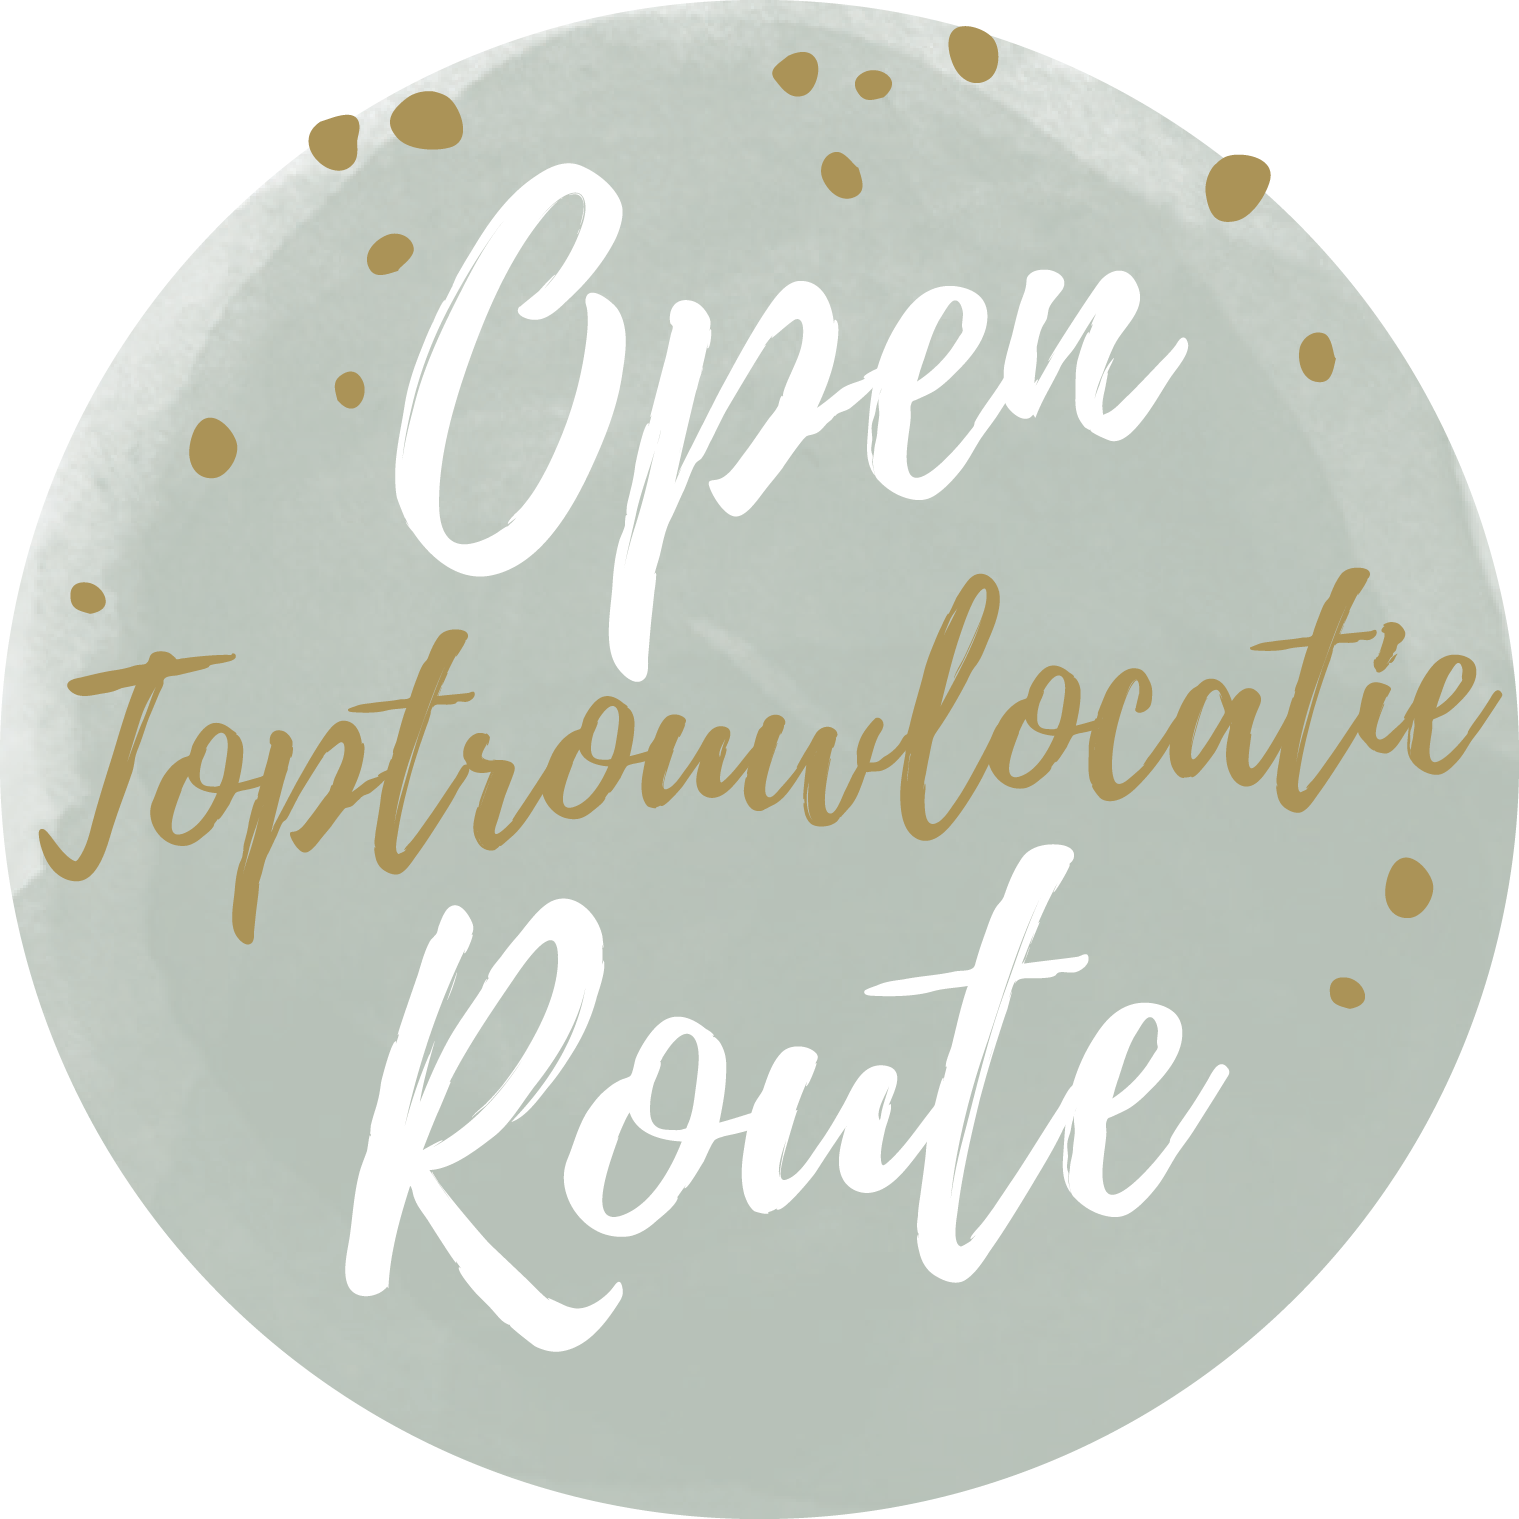 (c) Opentoptrouwlocatieroute.nl